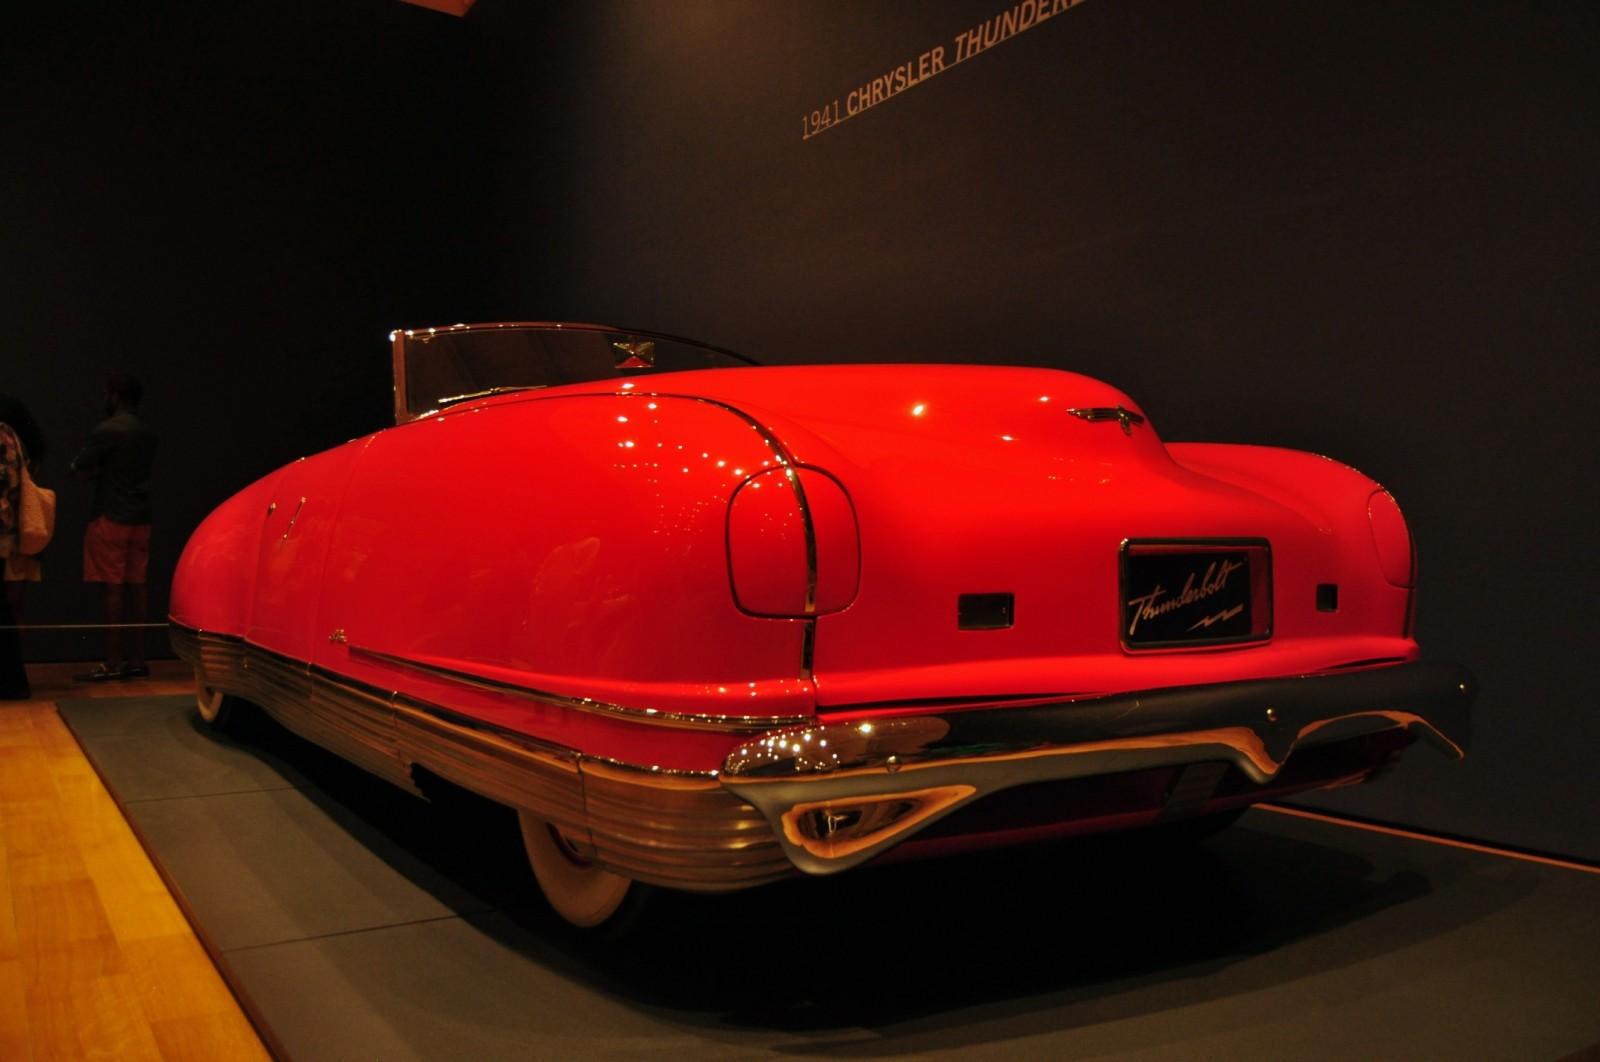 Atlanta Dream Cars Showcase - 1941 Chrysler Thunderbolt Is Aero Convertible Coupe 12